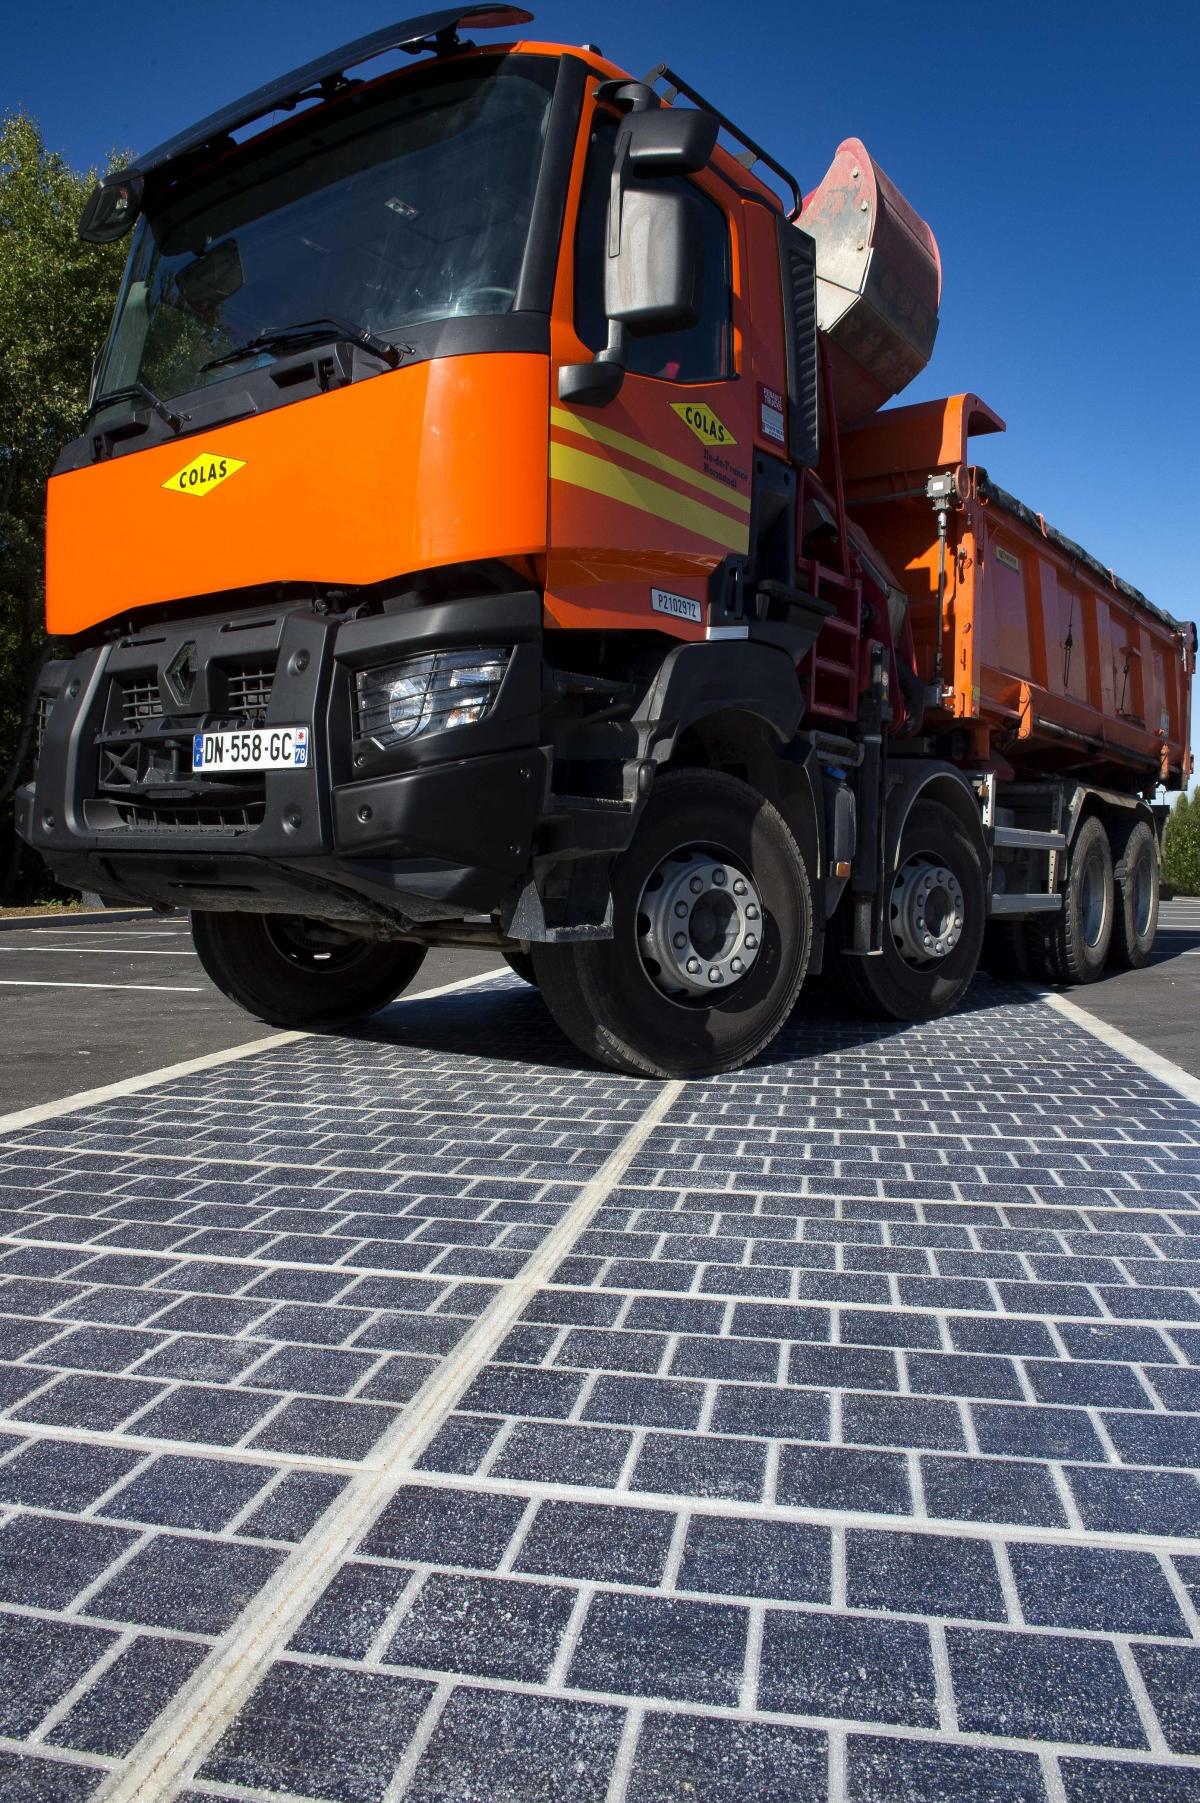 solar roads France